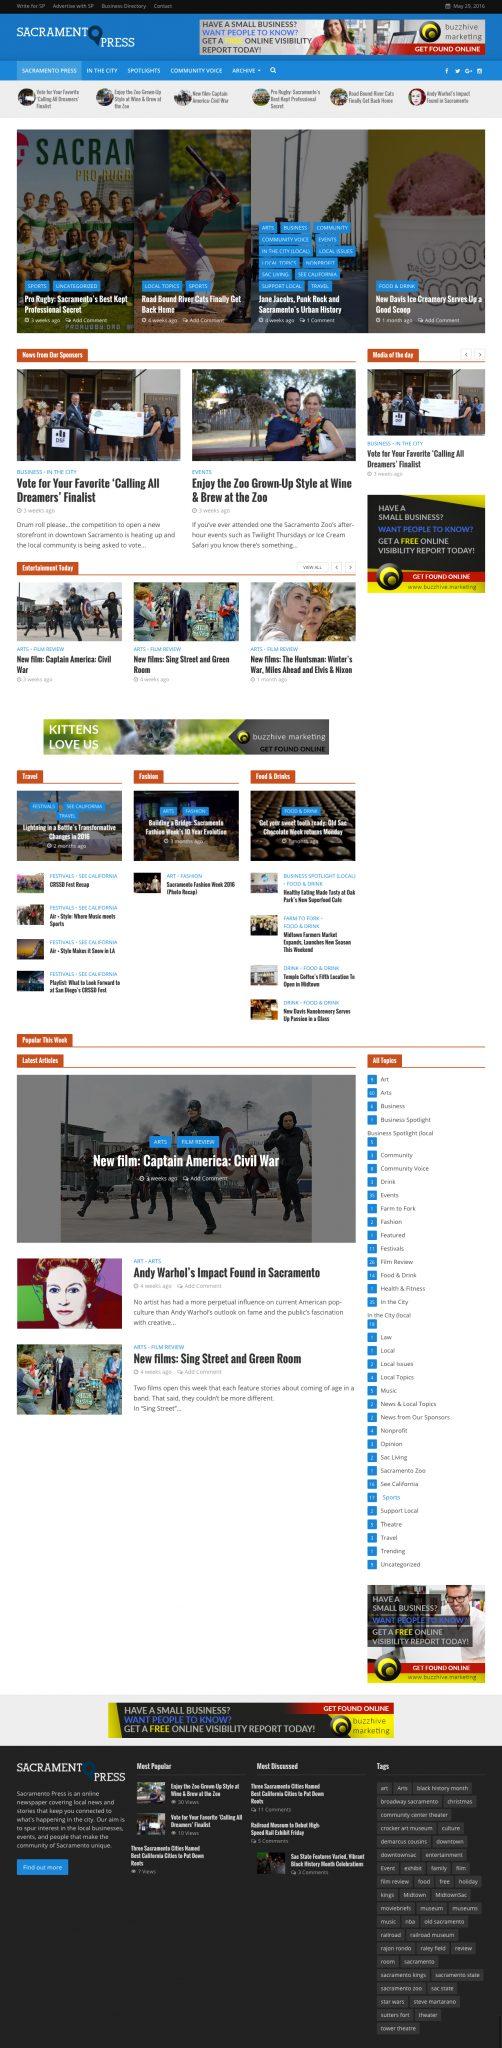 SacrementoPress.com-Under-Construction Web Design & Development